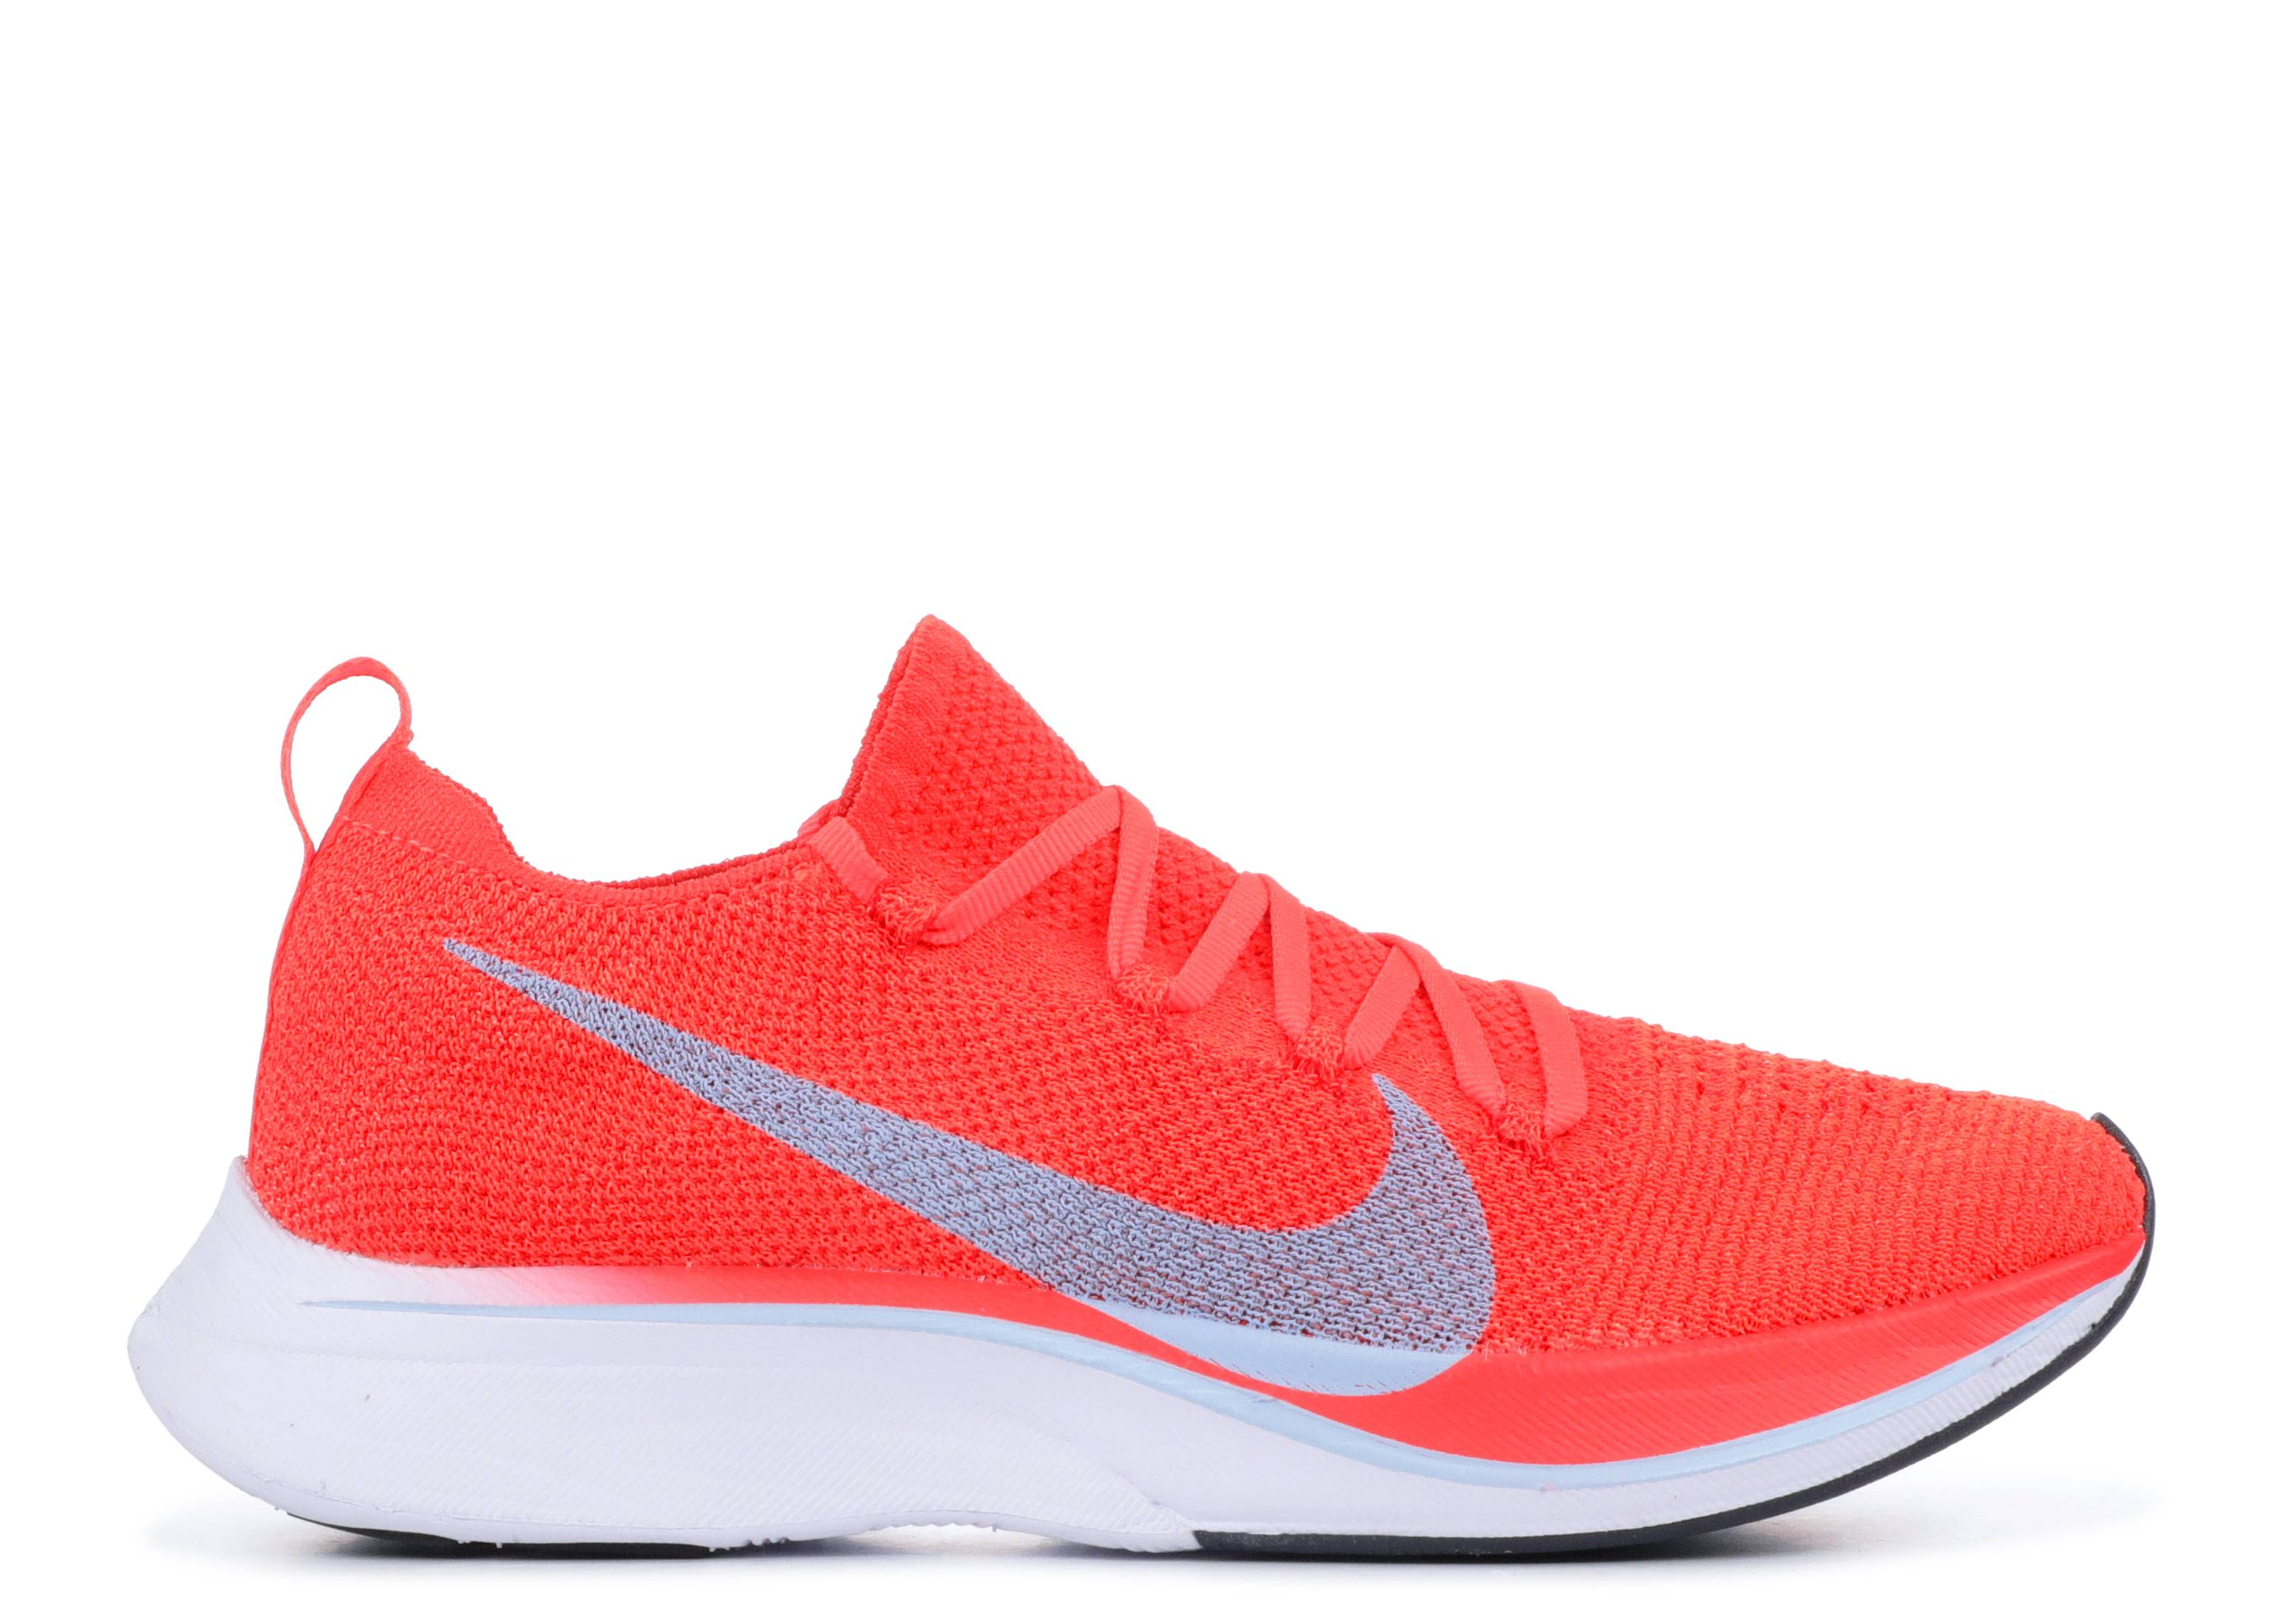 0eaa7953a77e Nike Vaporfly 4% Flyknit - Nike - aj3857 600 - bright crimson ice ...